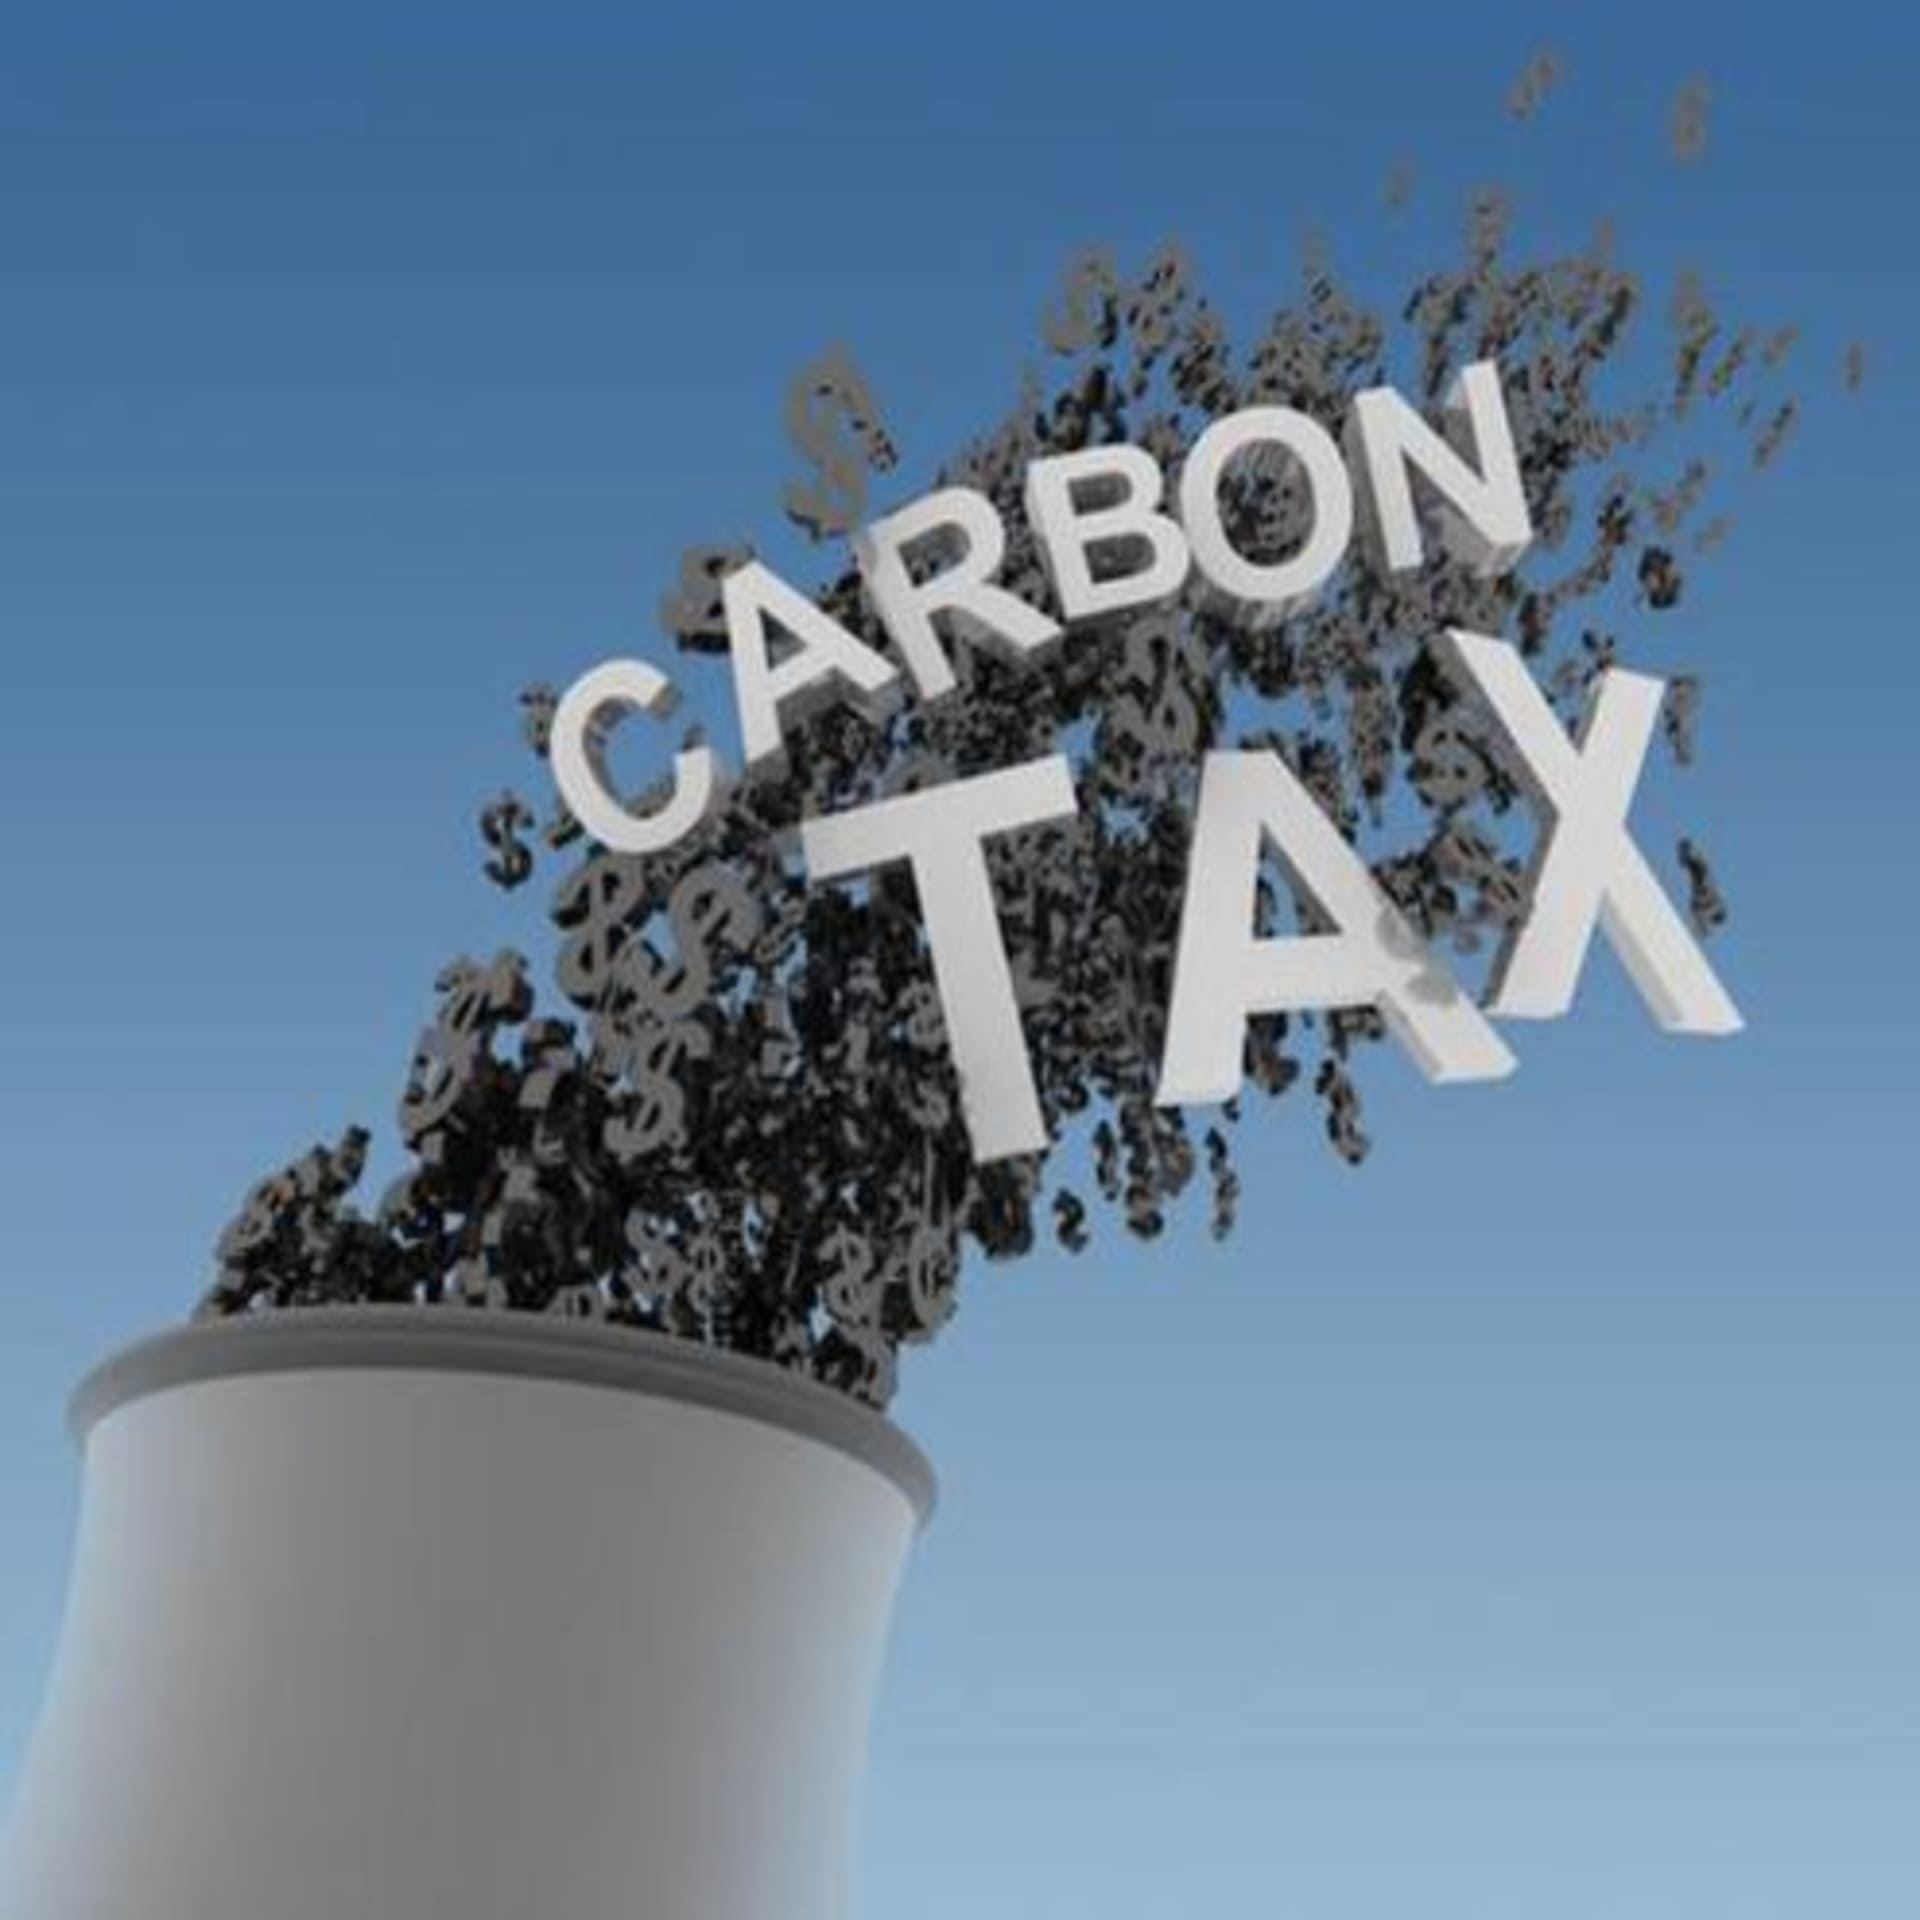 carbon-tax.JPG-w1920.jpg